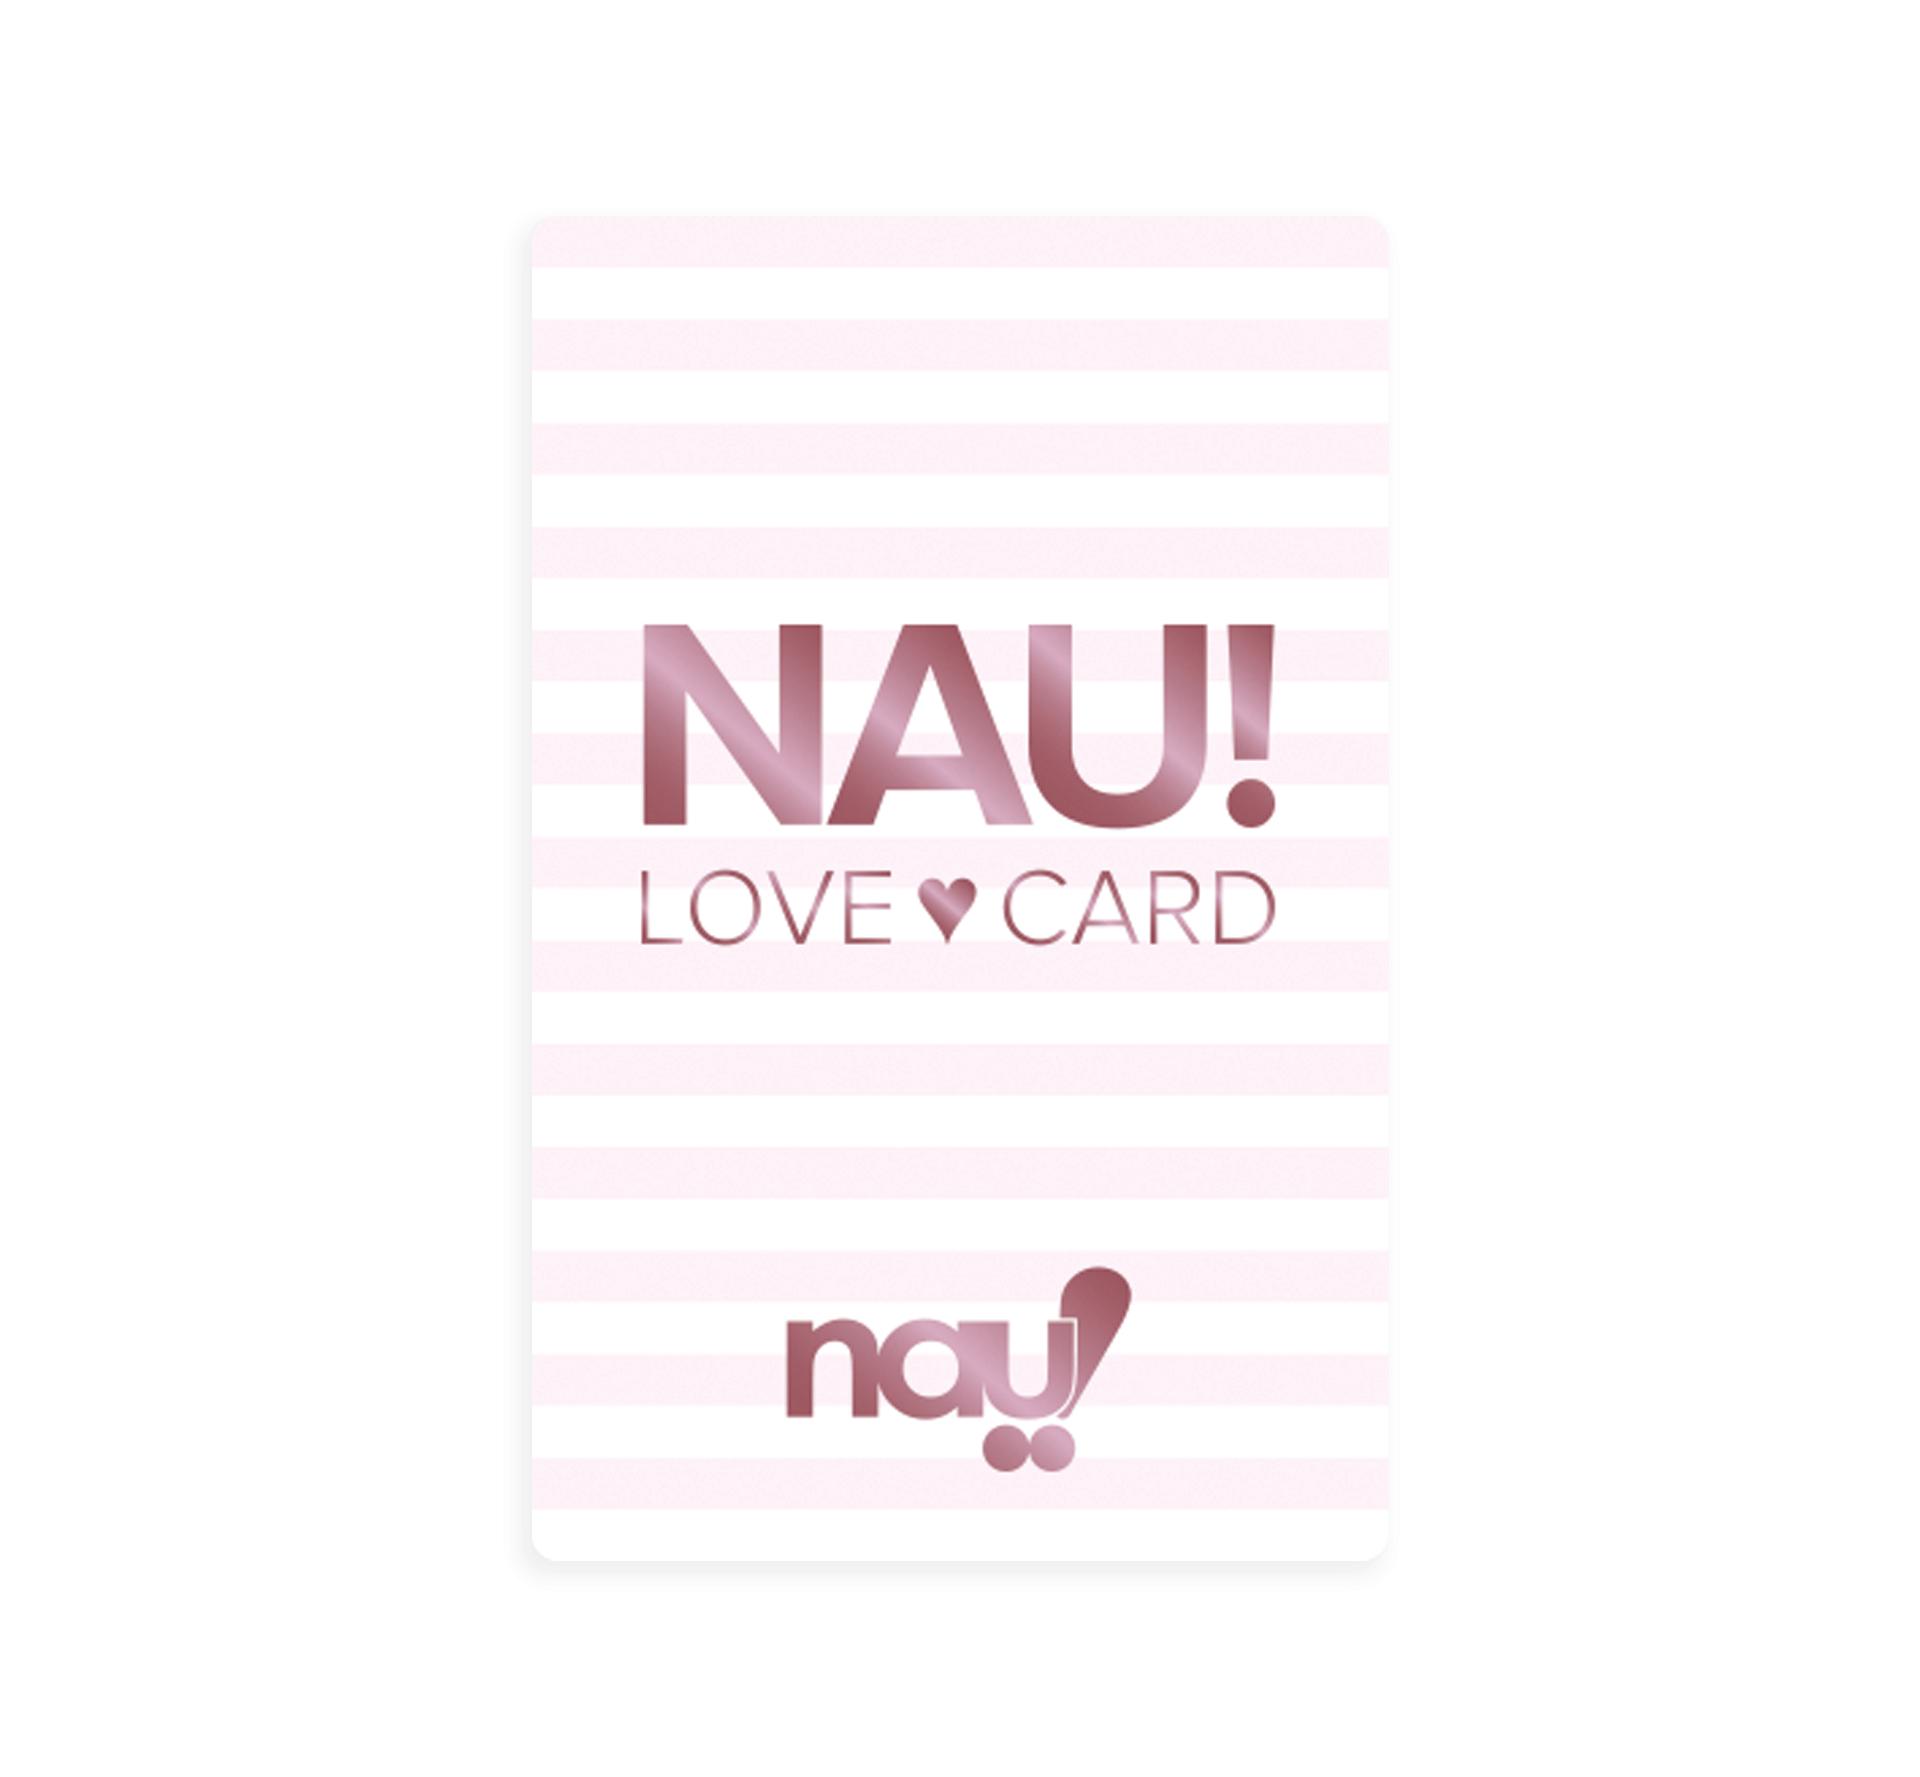 NAU! LOVE CARD